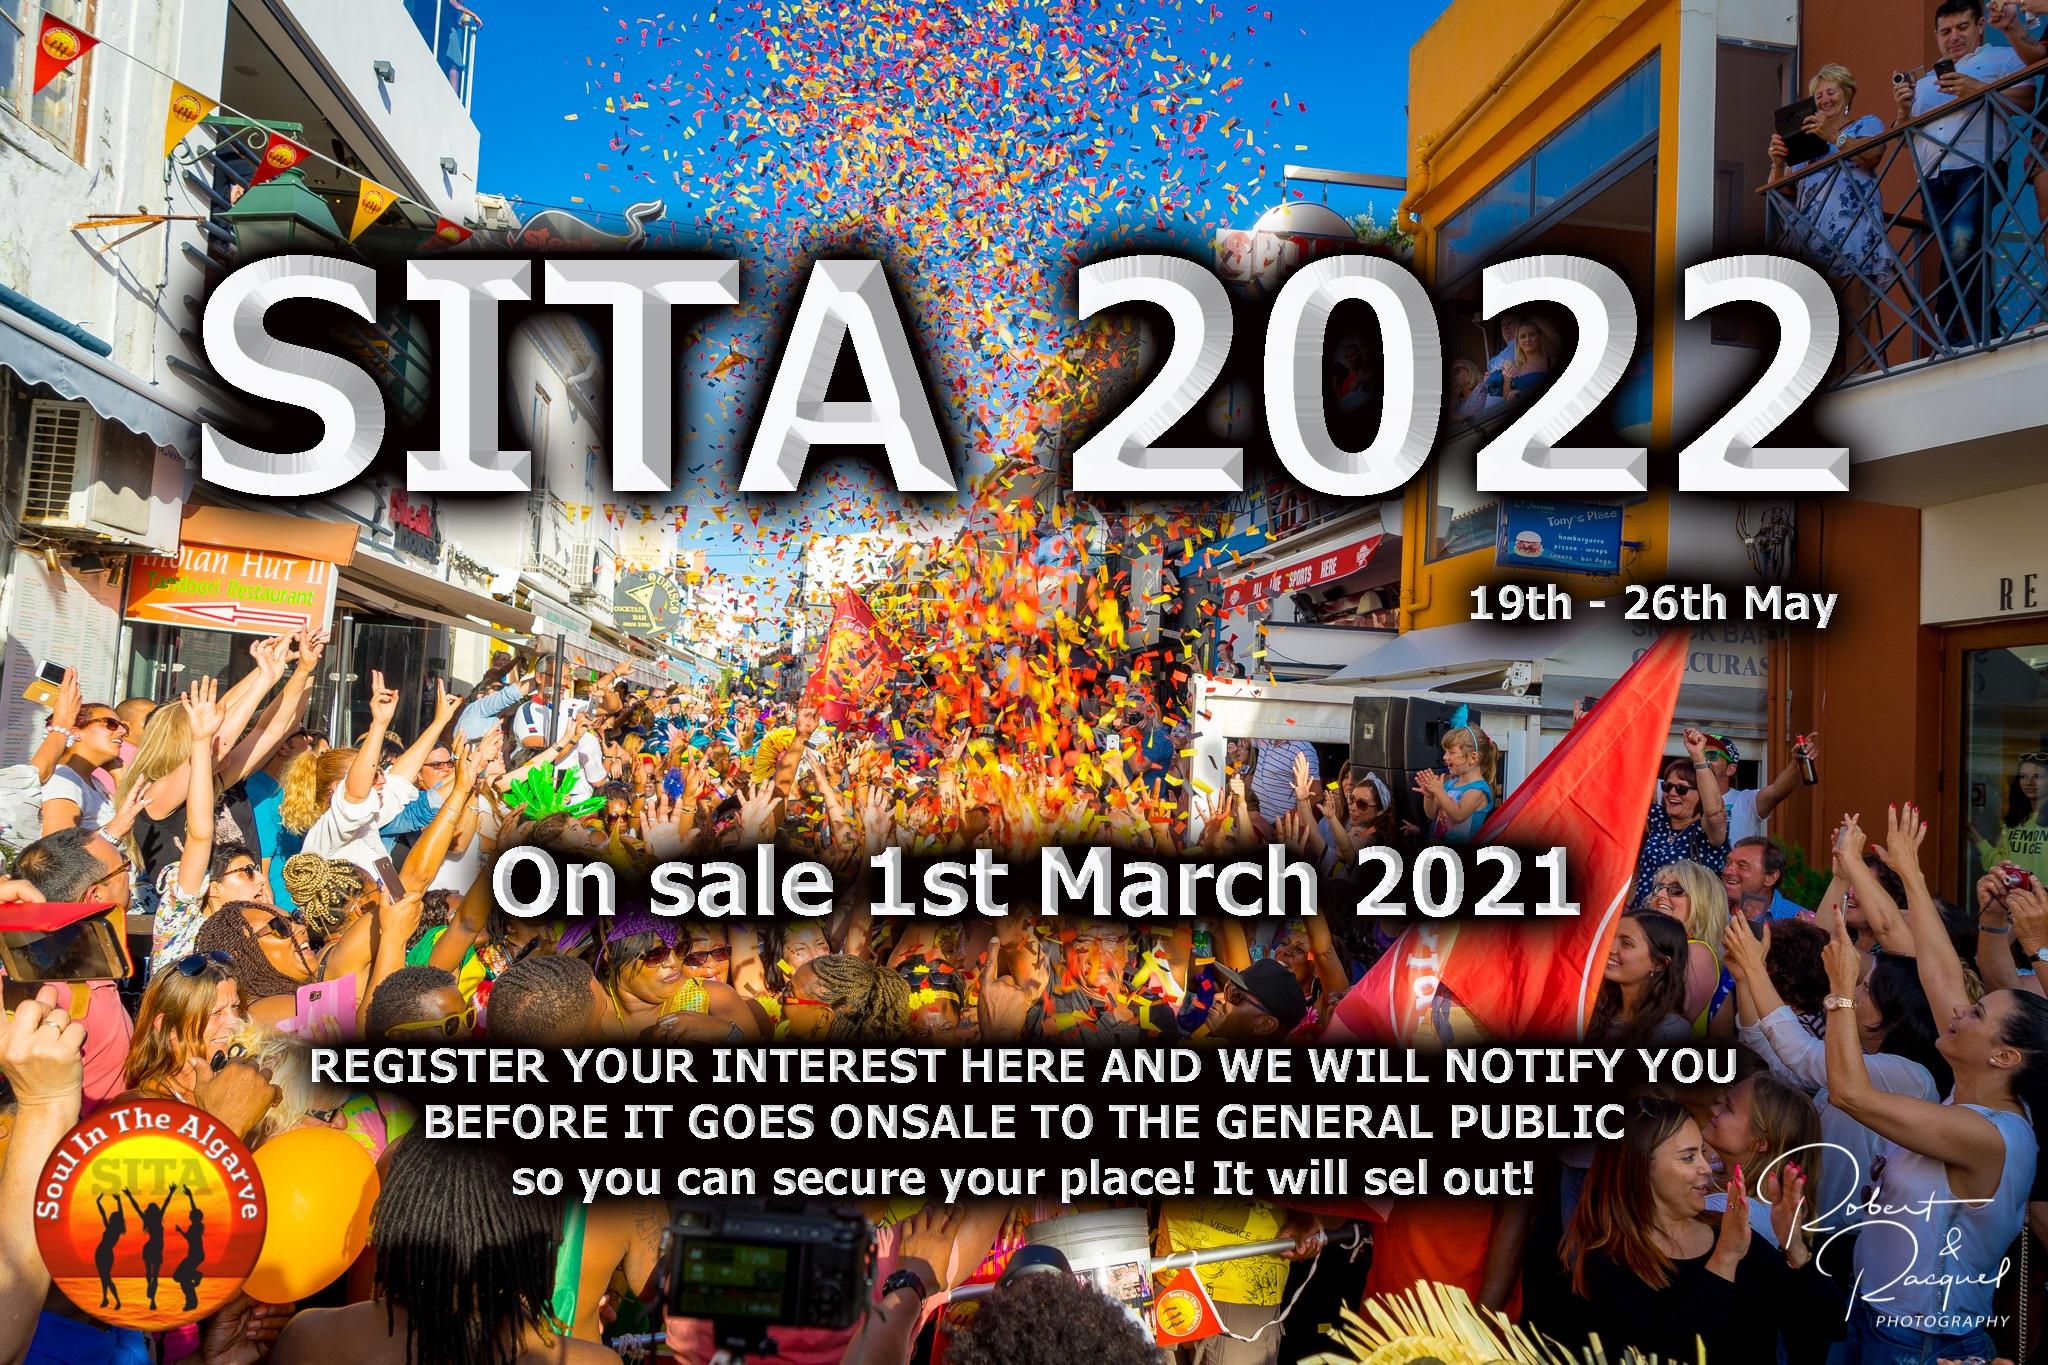 SITA 2022 ON SALE March 1st 2021